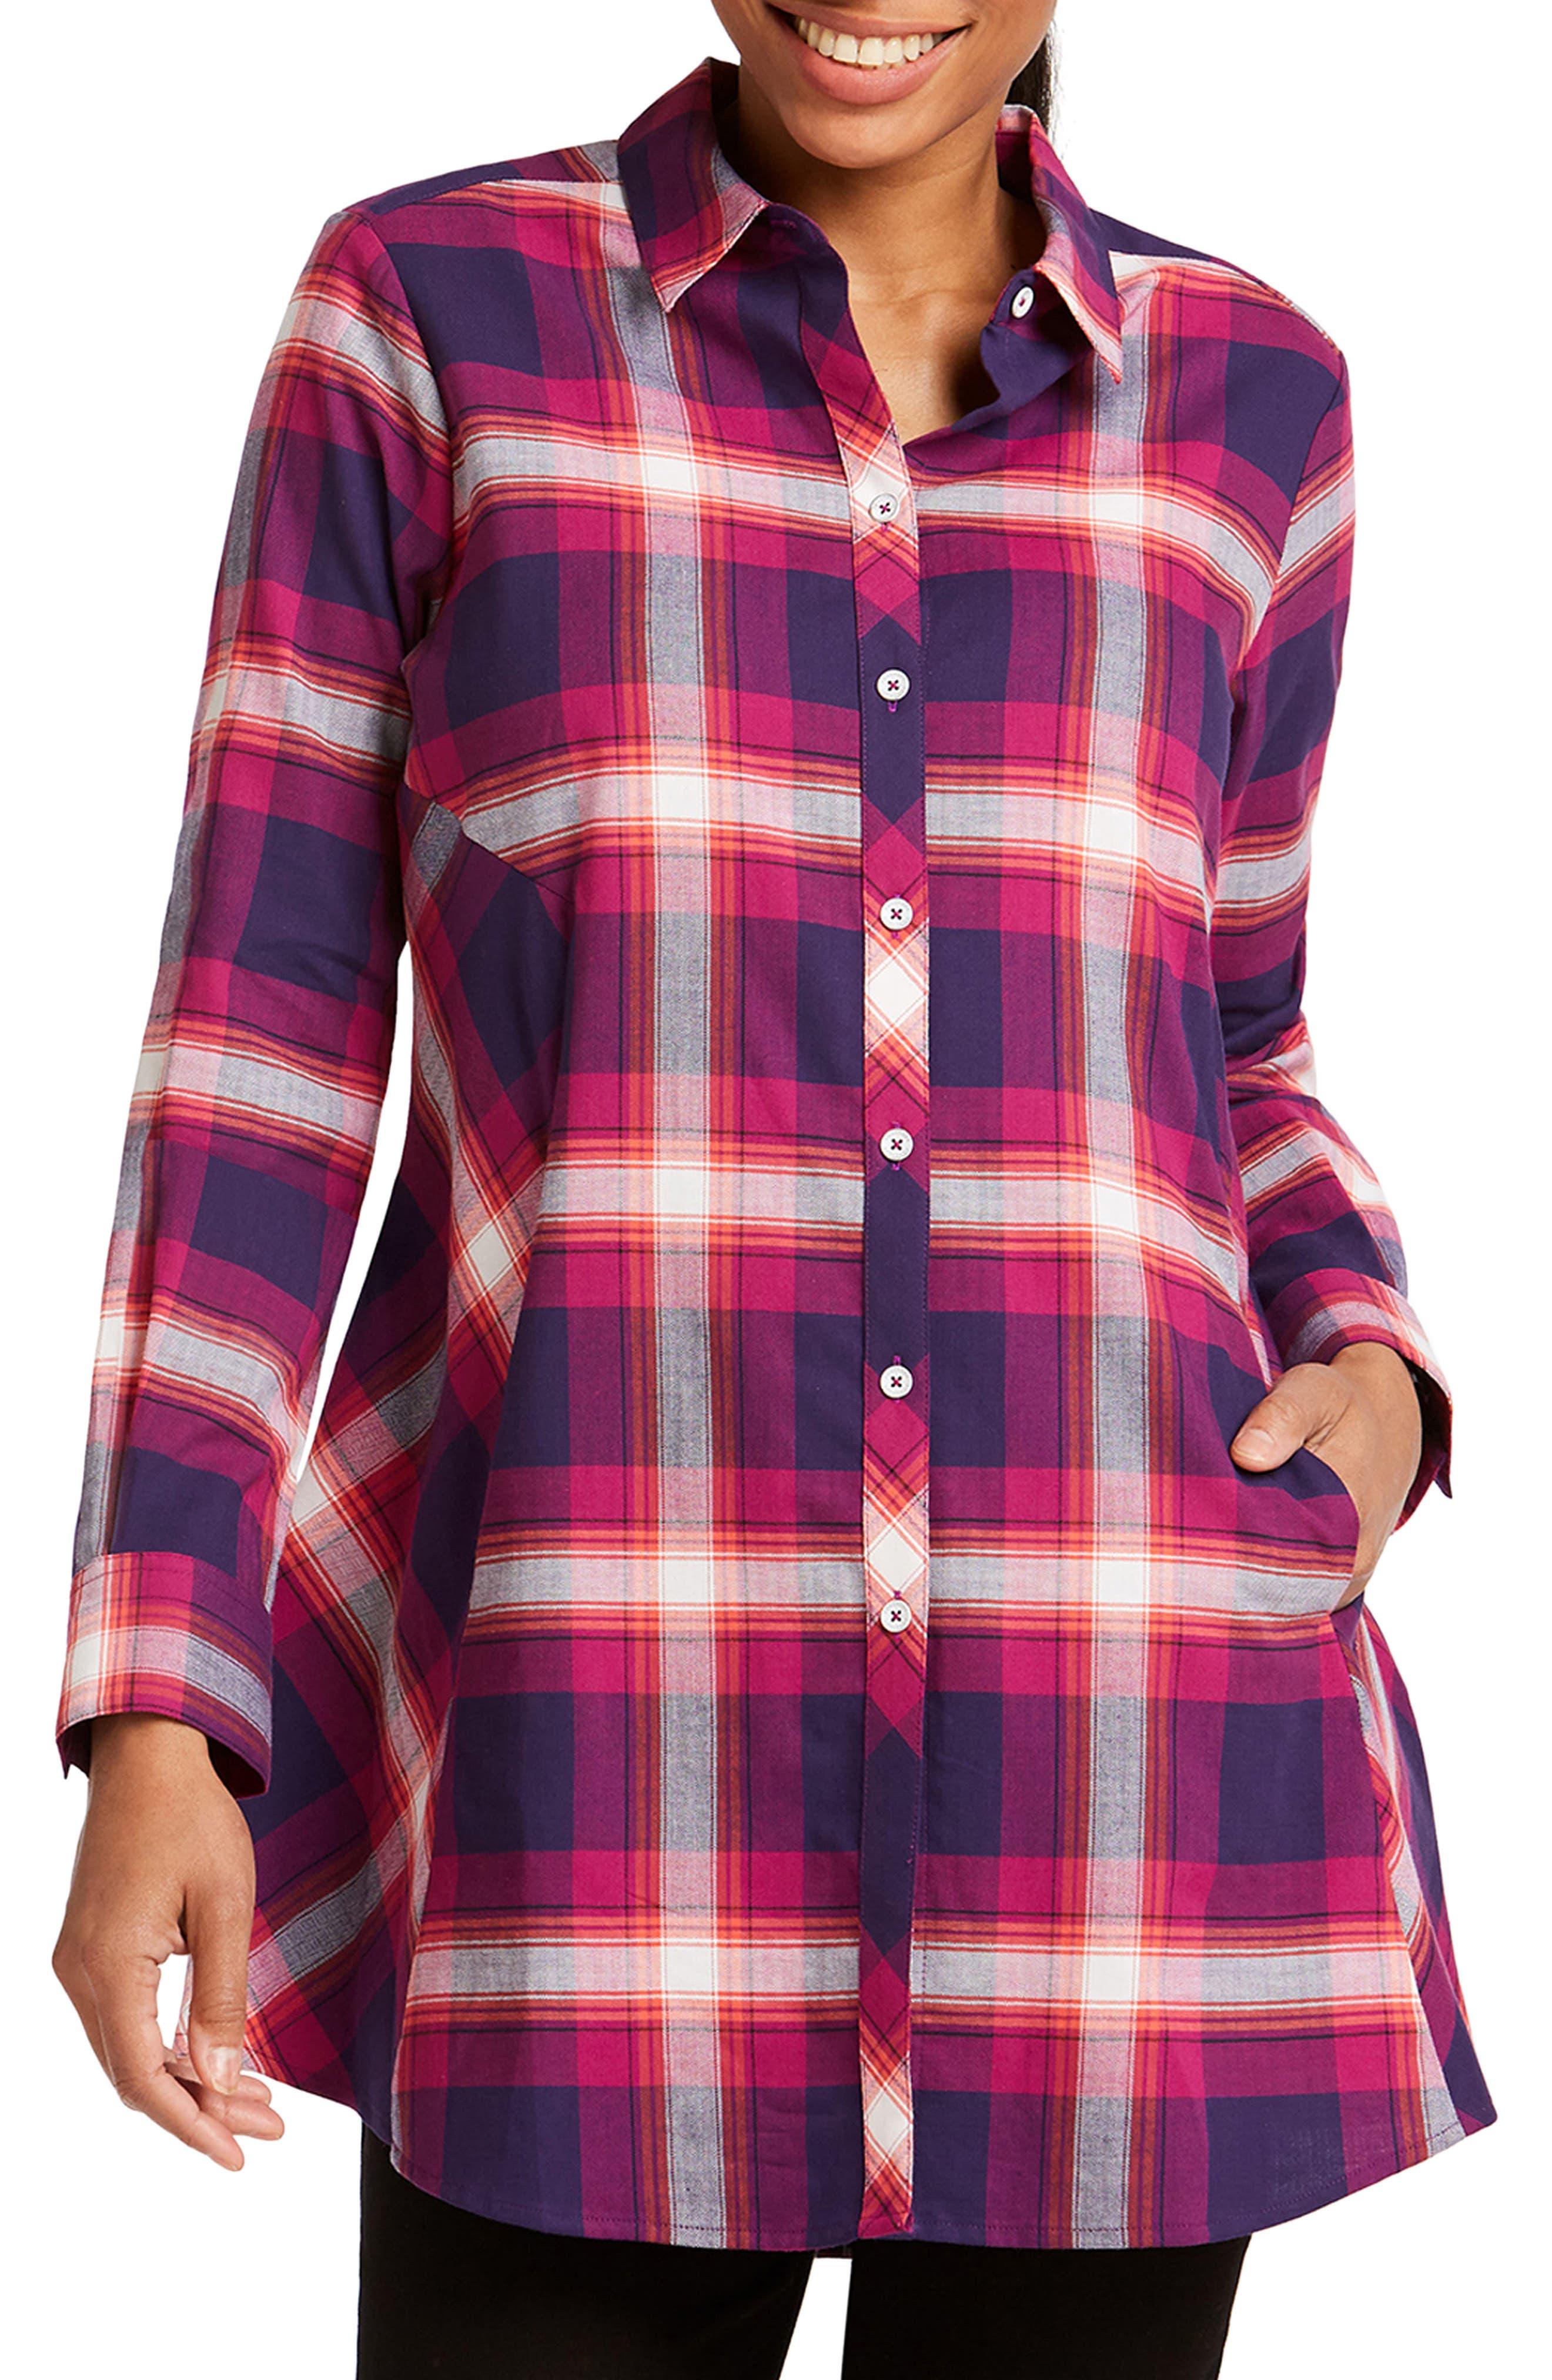 Cici Tartan Plaid Brushed Cotton Blend Tunic Top,                             Main thumbnail 1, color,                             001